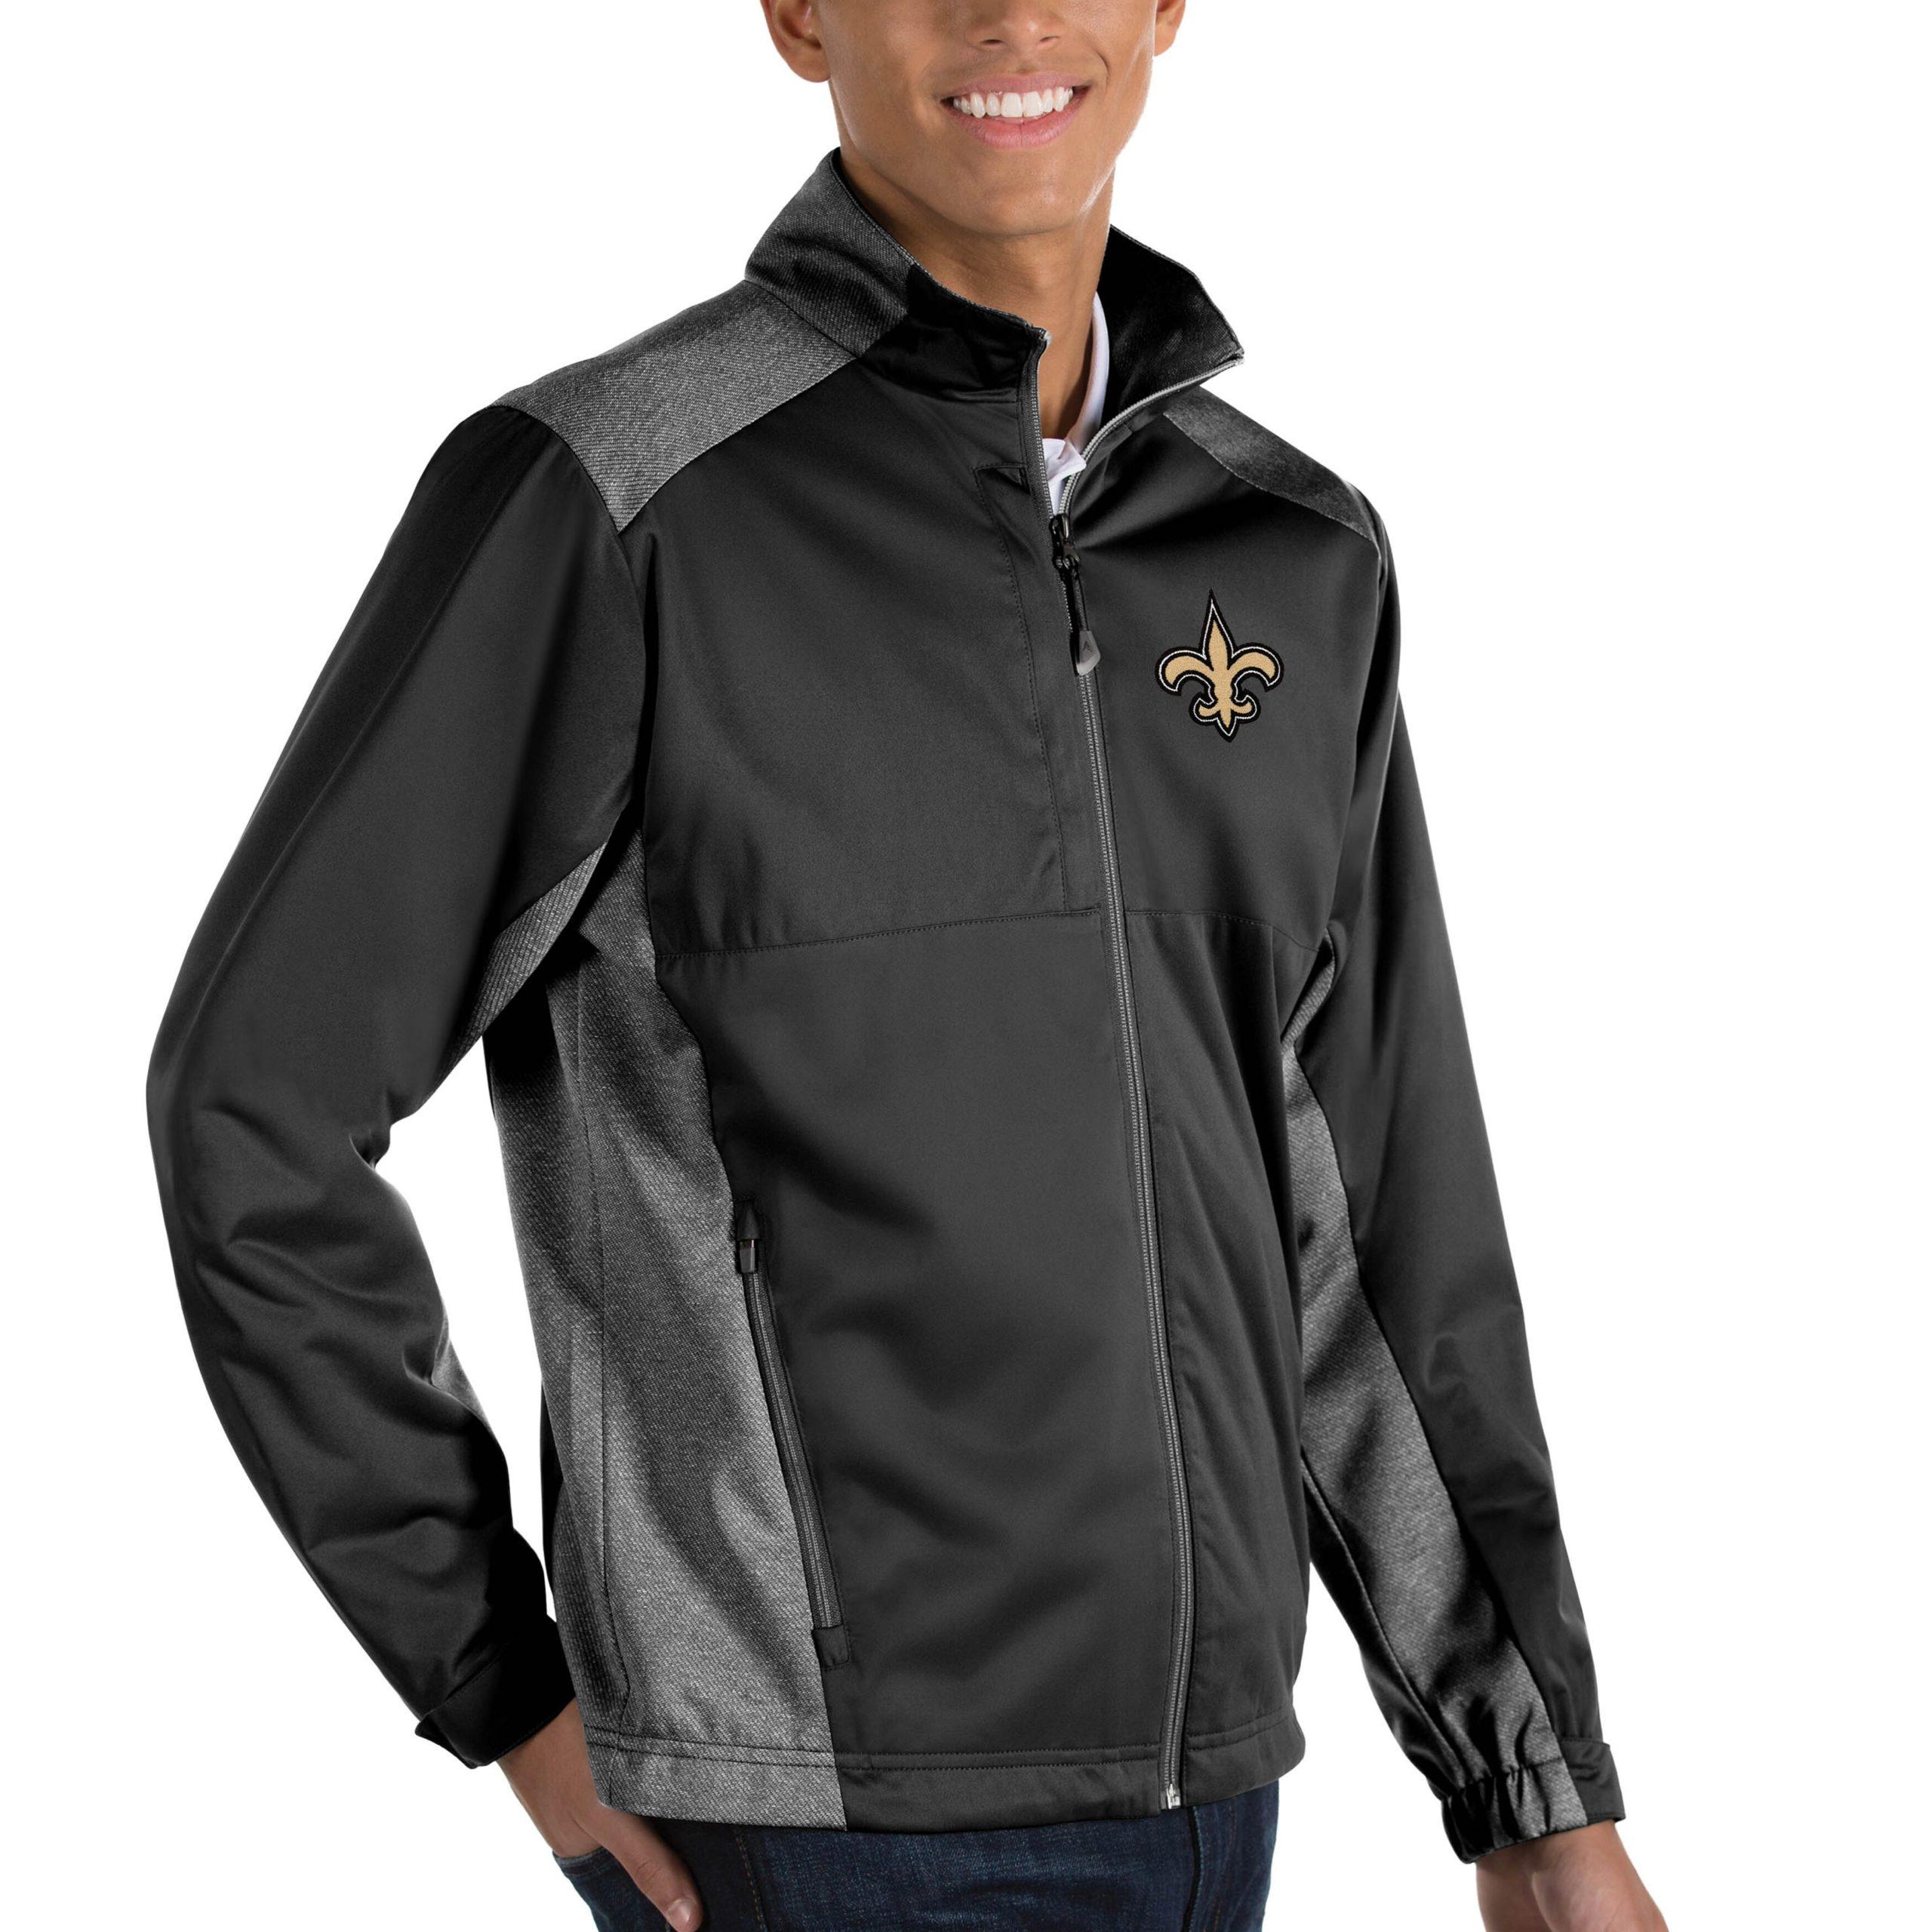 New Orleans Saints Antigua Revolve Big & Tall Full-Zip Jacket - Heather Black